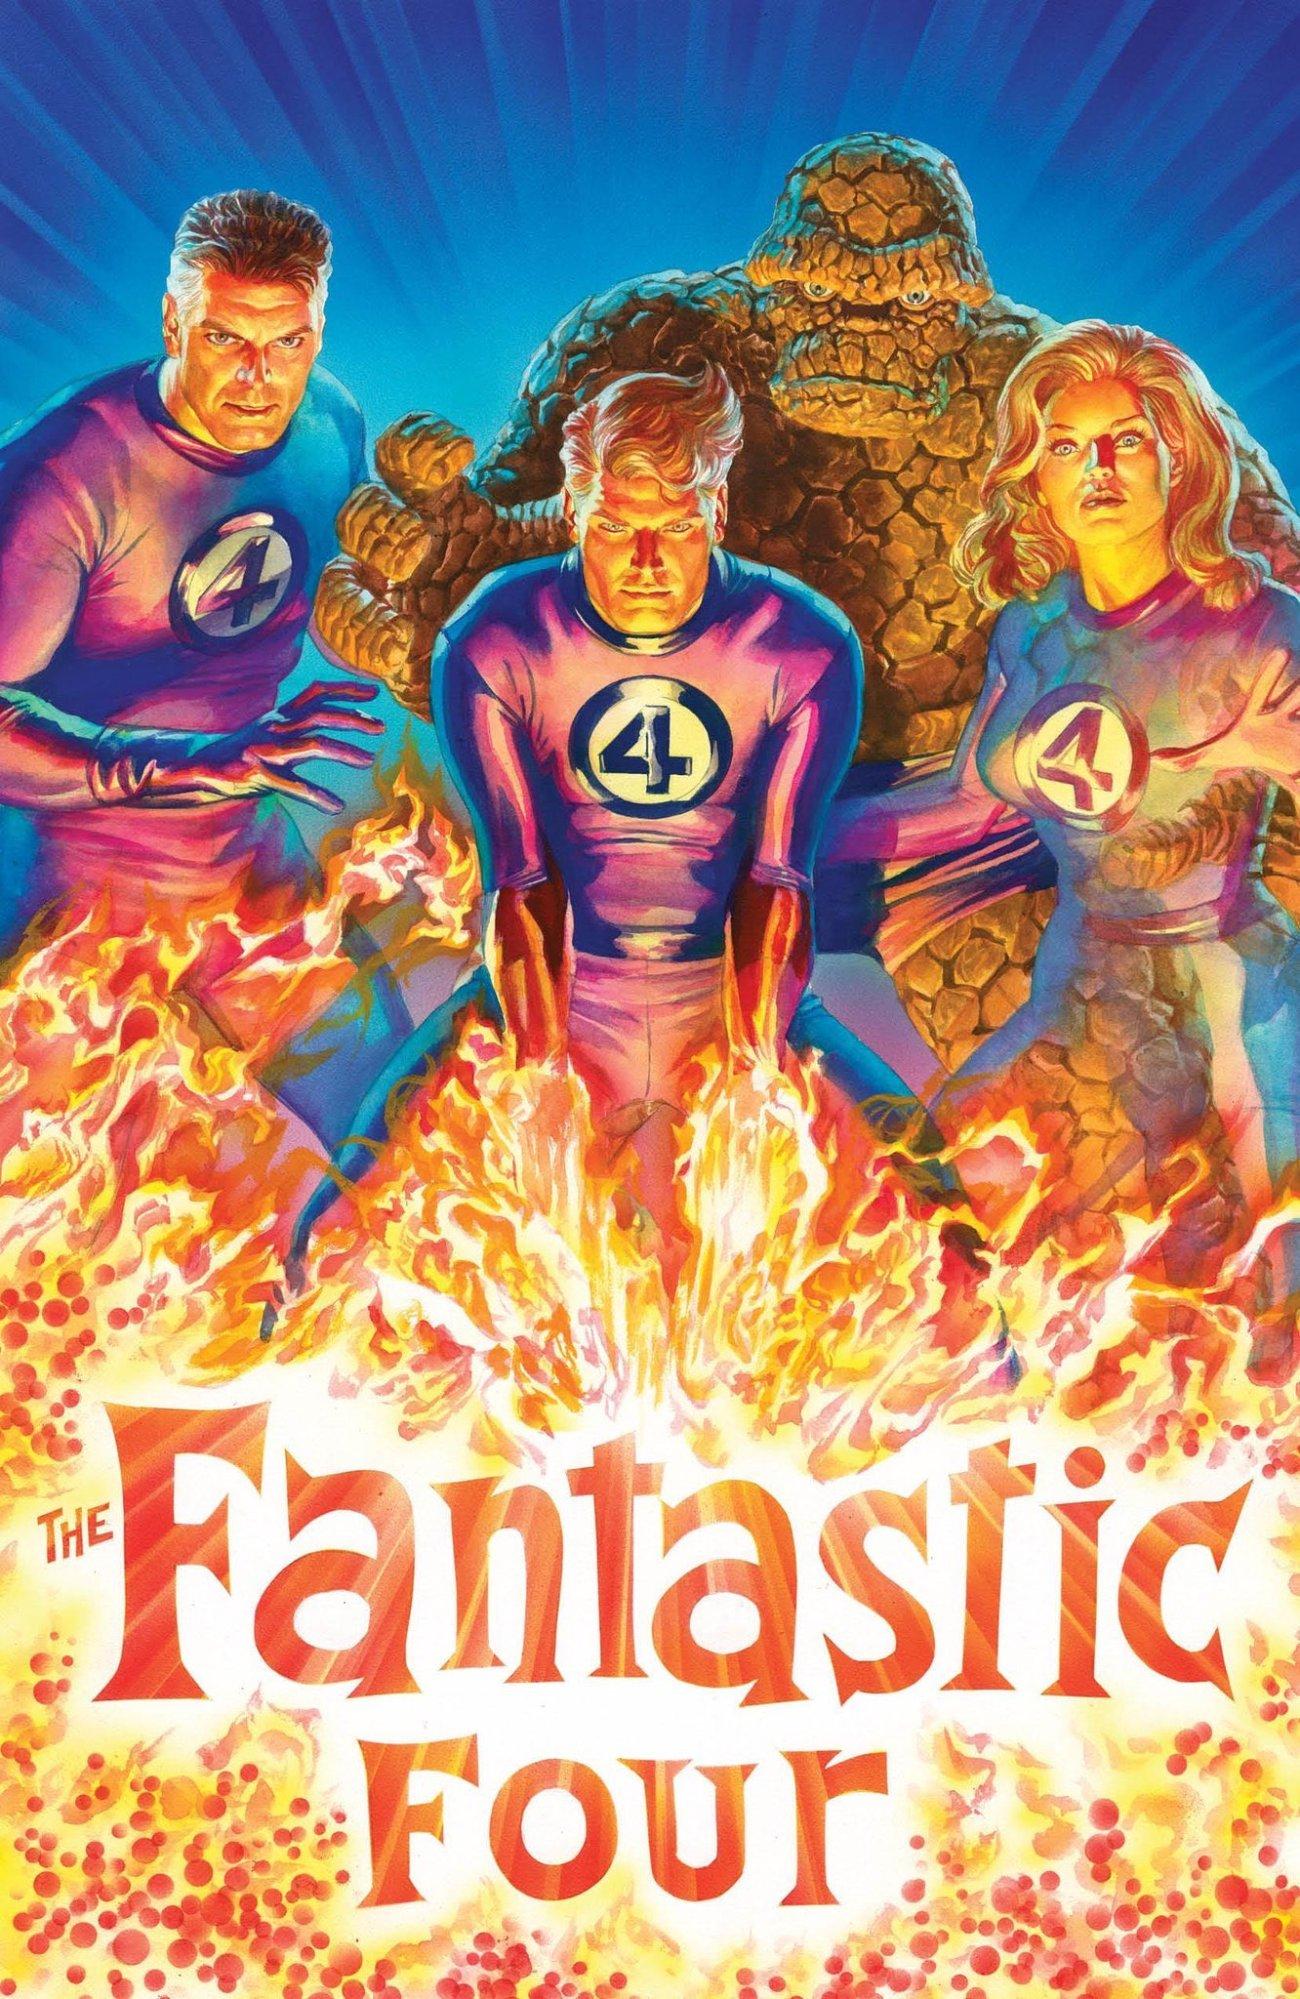 The Fantastic Four por el artista Alex Ross. Imagen: Alex Ross Twitter (@thealexrossart).